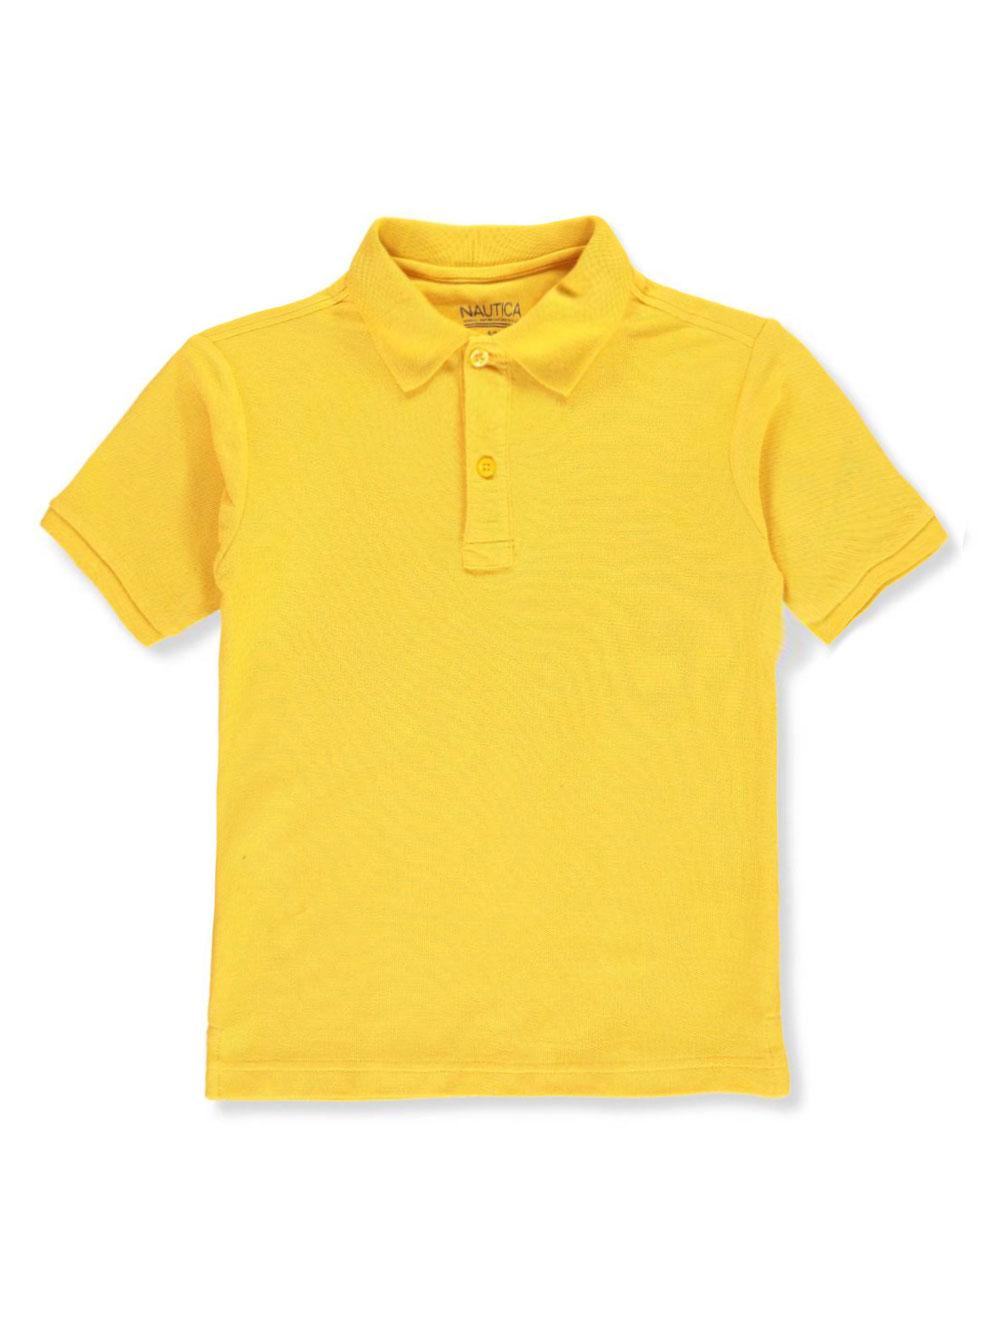 X-Large-18//20 Nautica Boys Husky School Uniform Short Sleeve Performance Polo Light Yellow